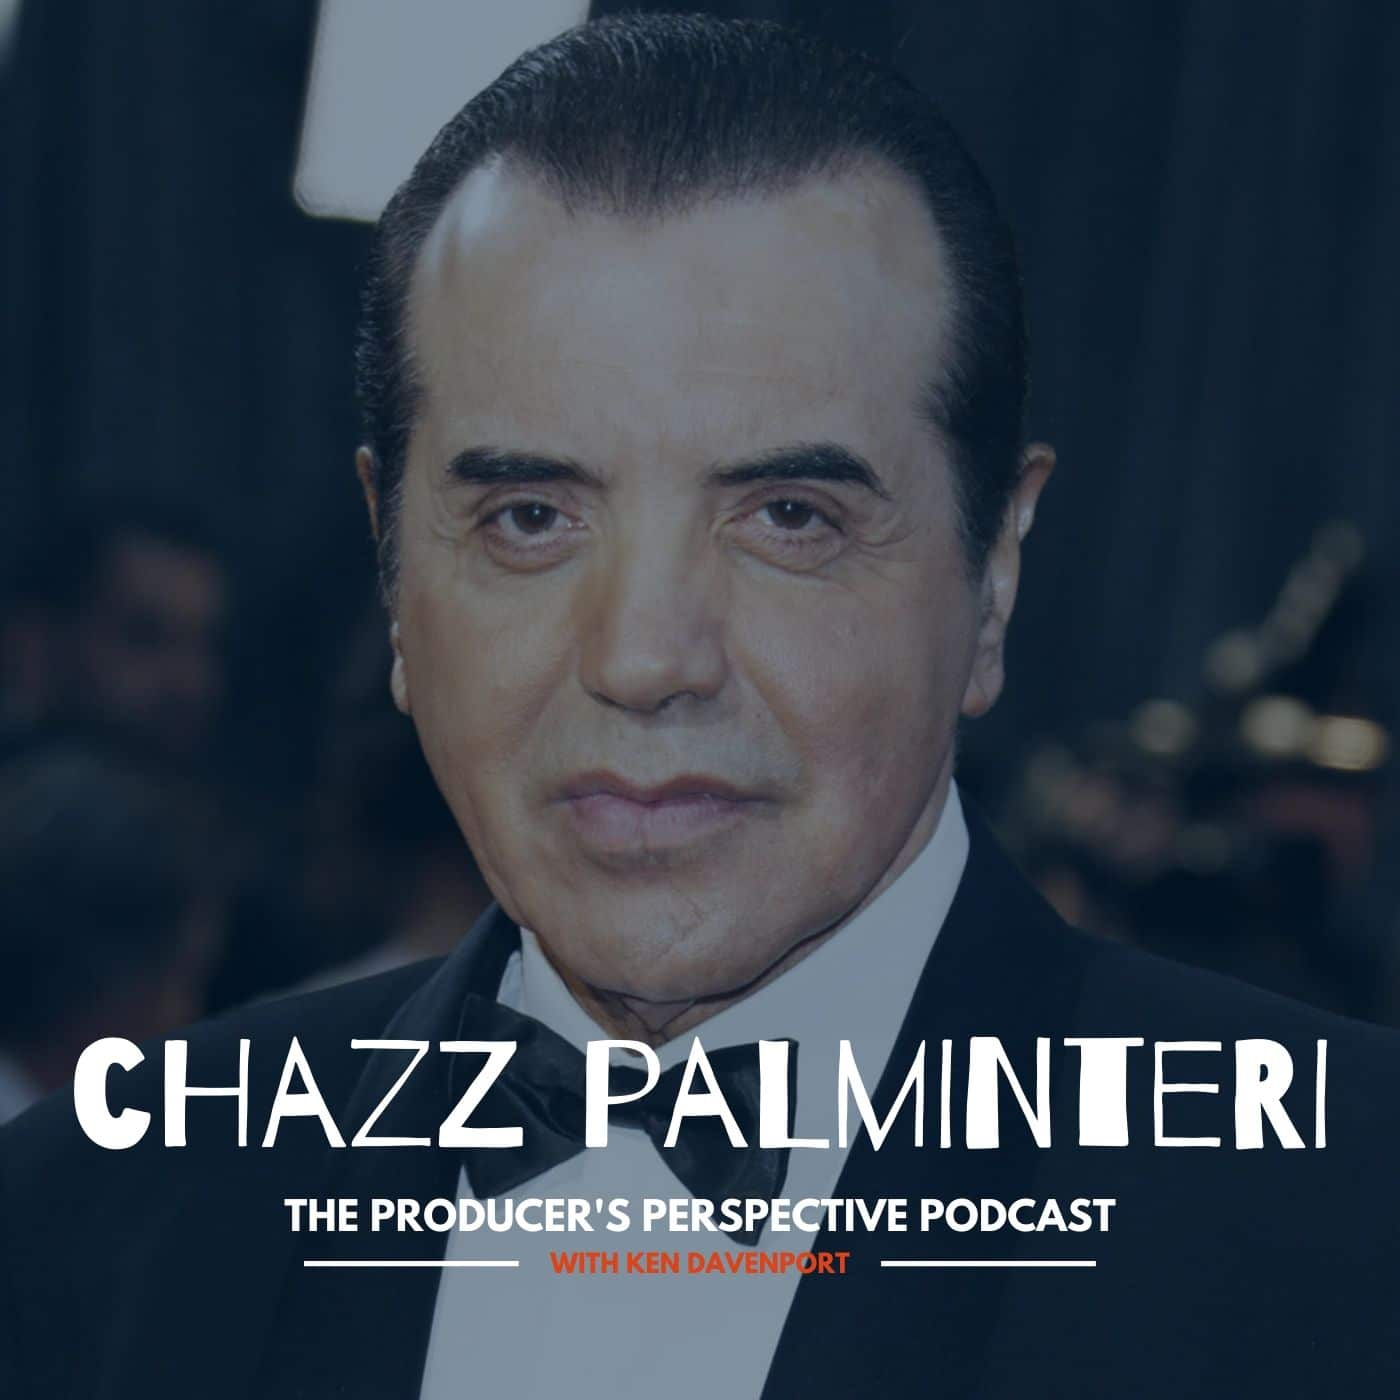 Ken Davenport's The Producer's Perspective Podcast Episode 127 - Chazz Palminteri